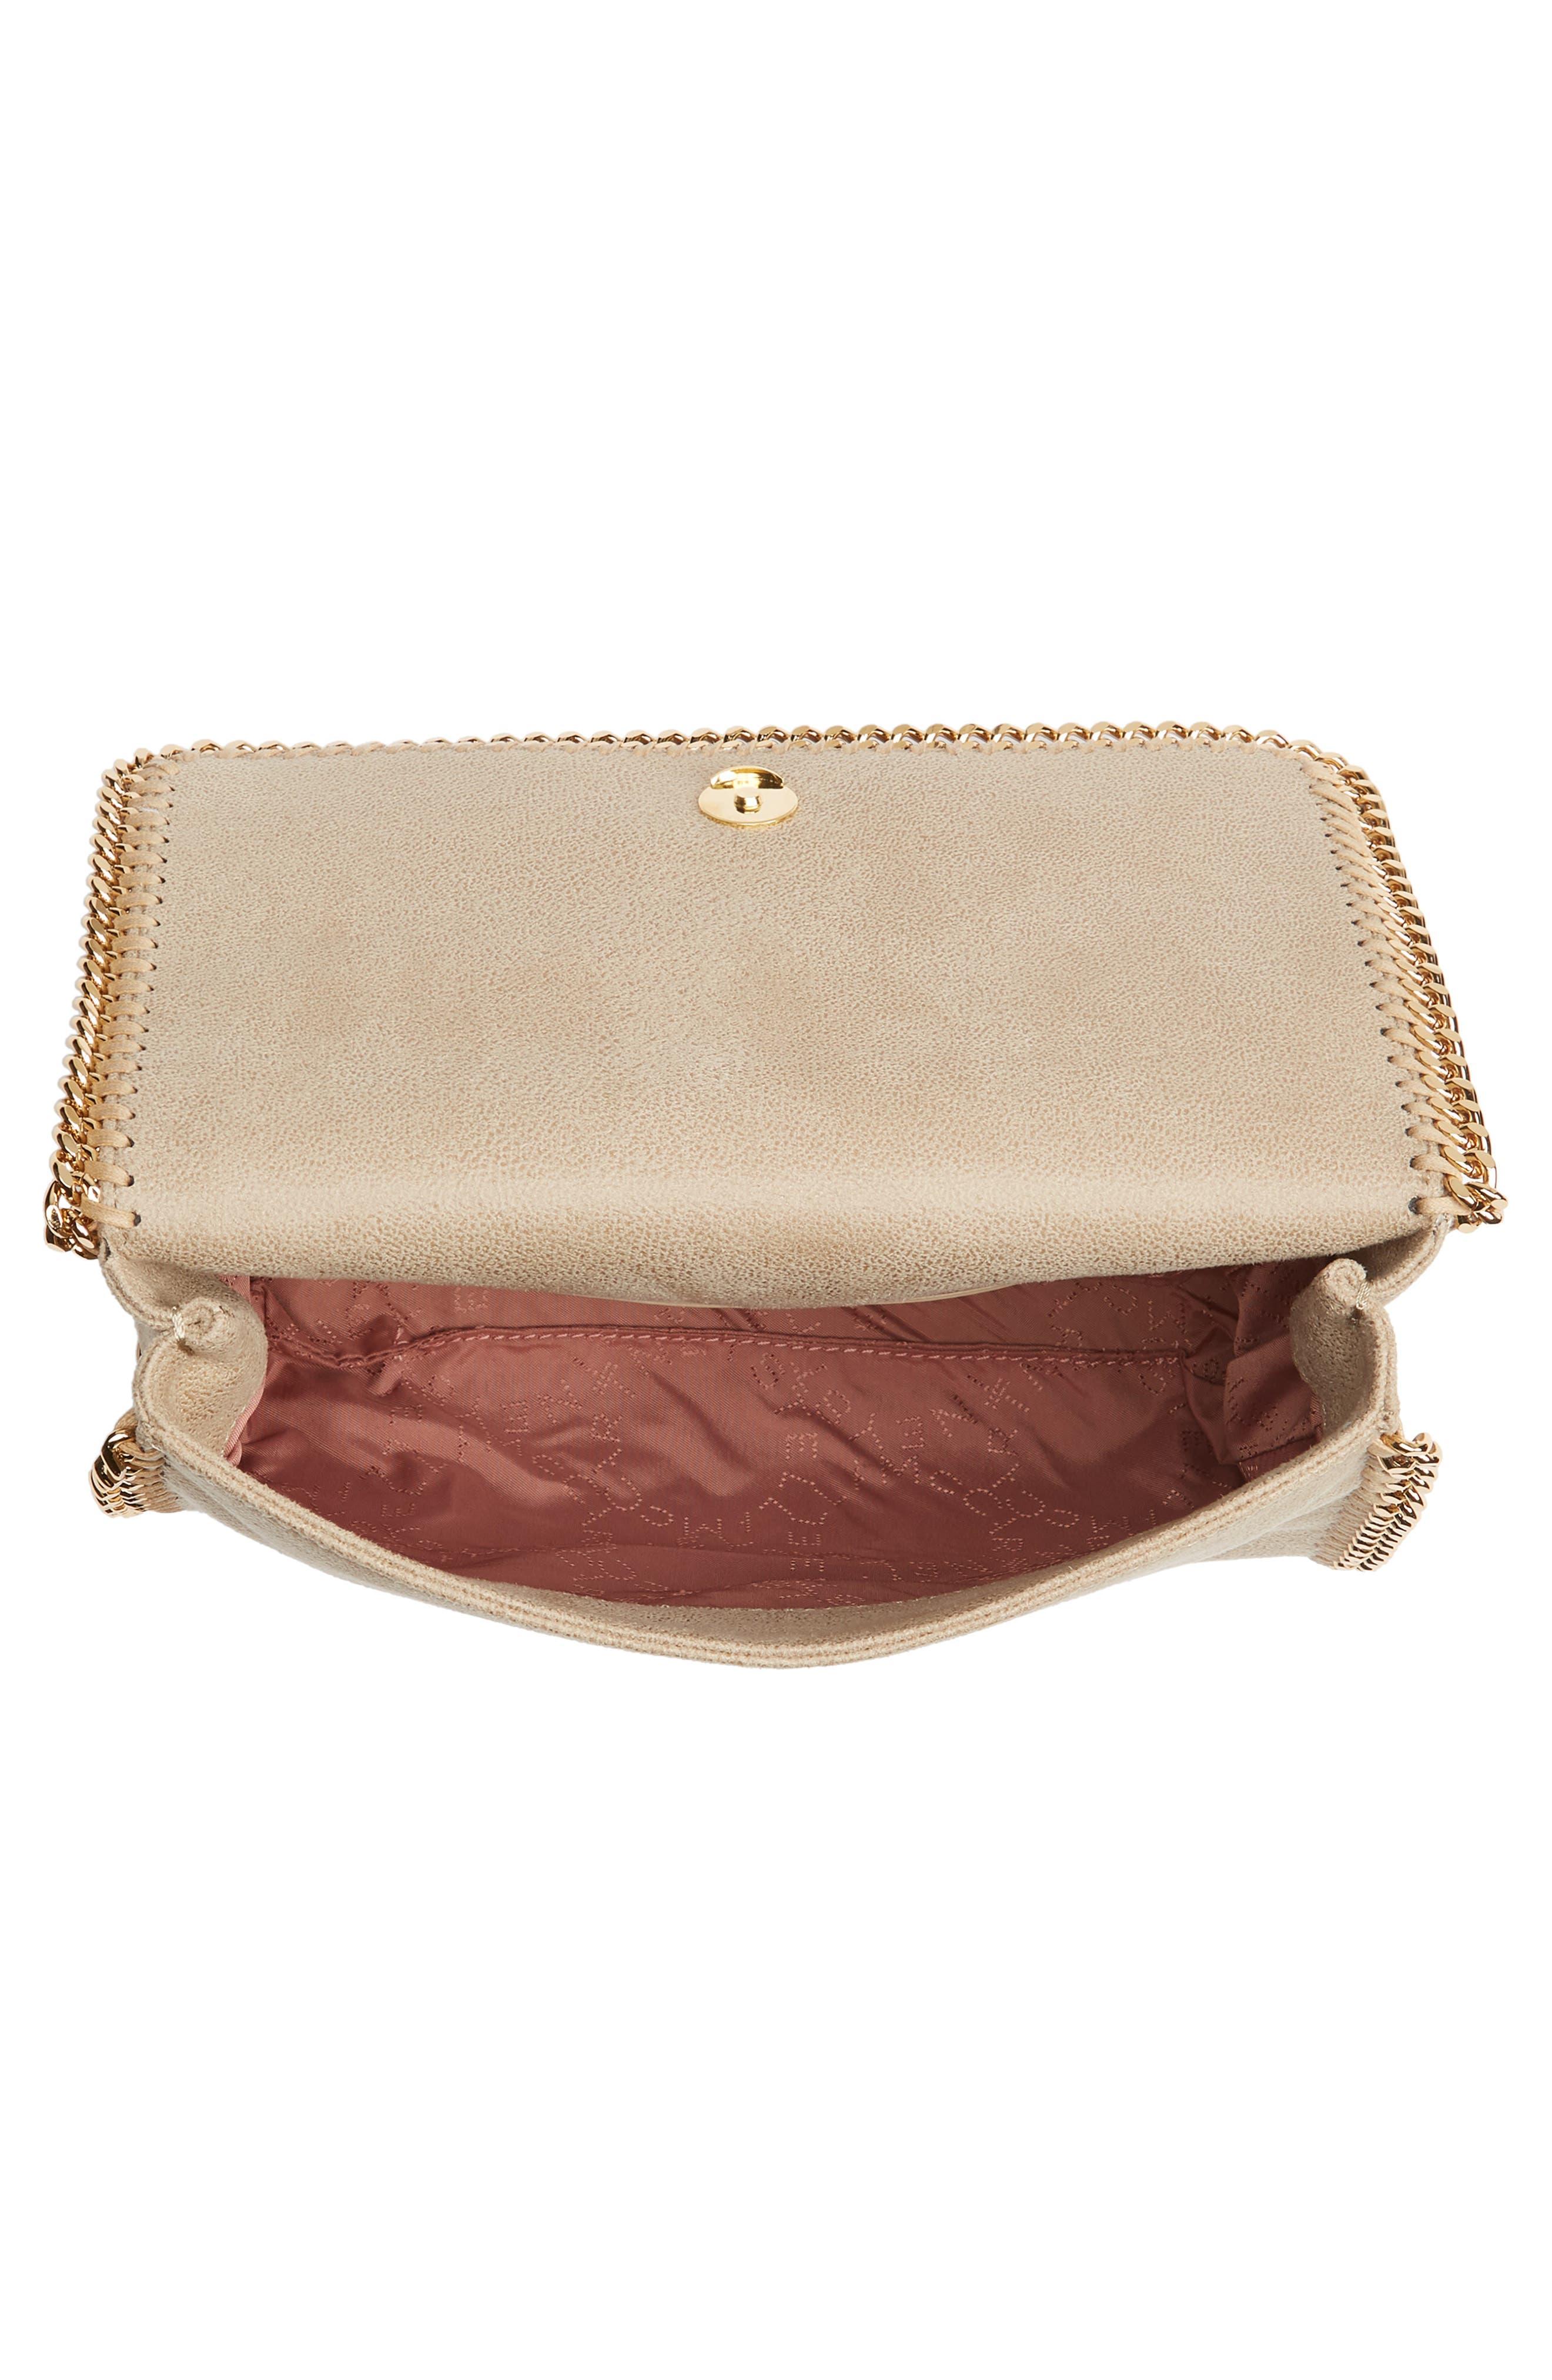 STELLA MCCARTNEY, Falabella Shaggy Deer Faux Leather Shoulder Bag, Alternate thumbnail 5, color, CLOTTED CREAM